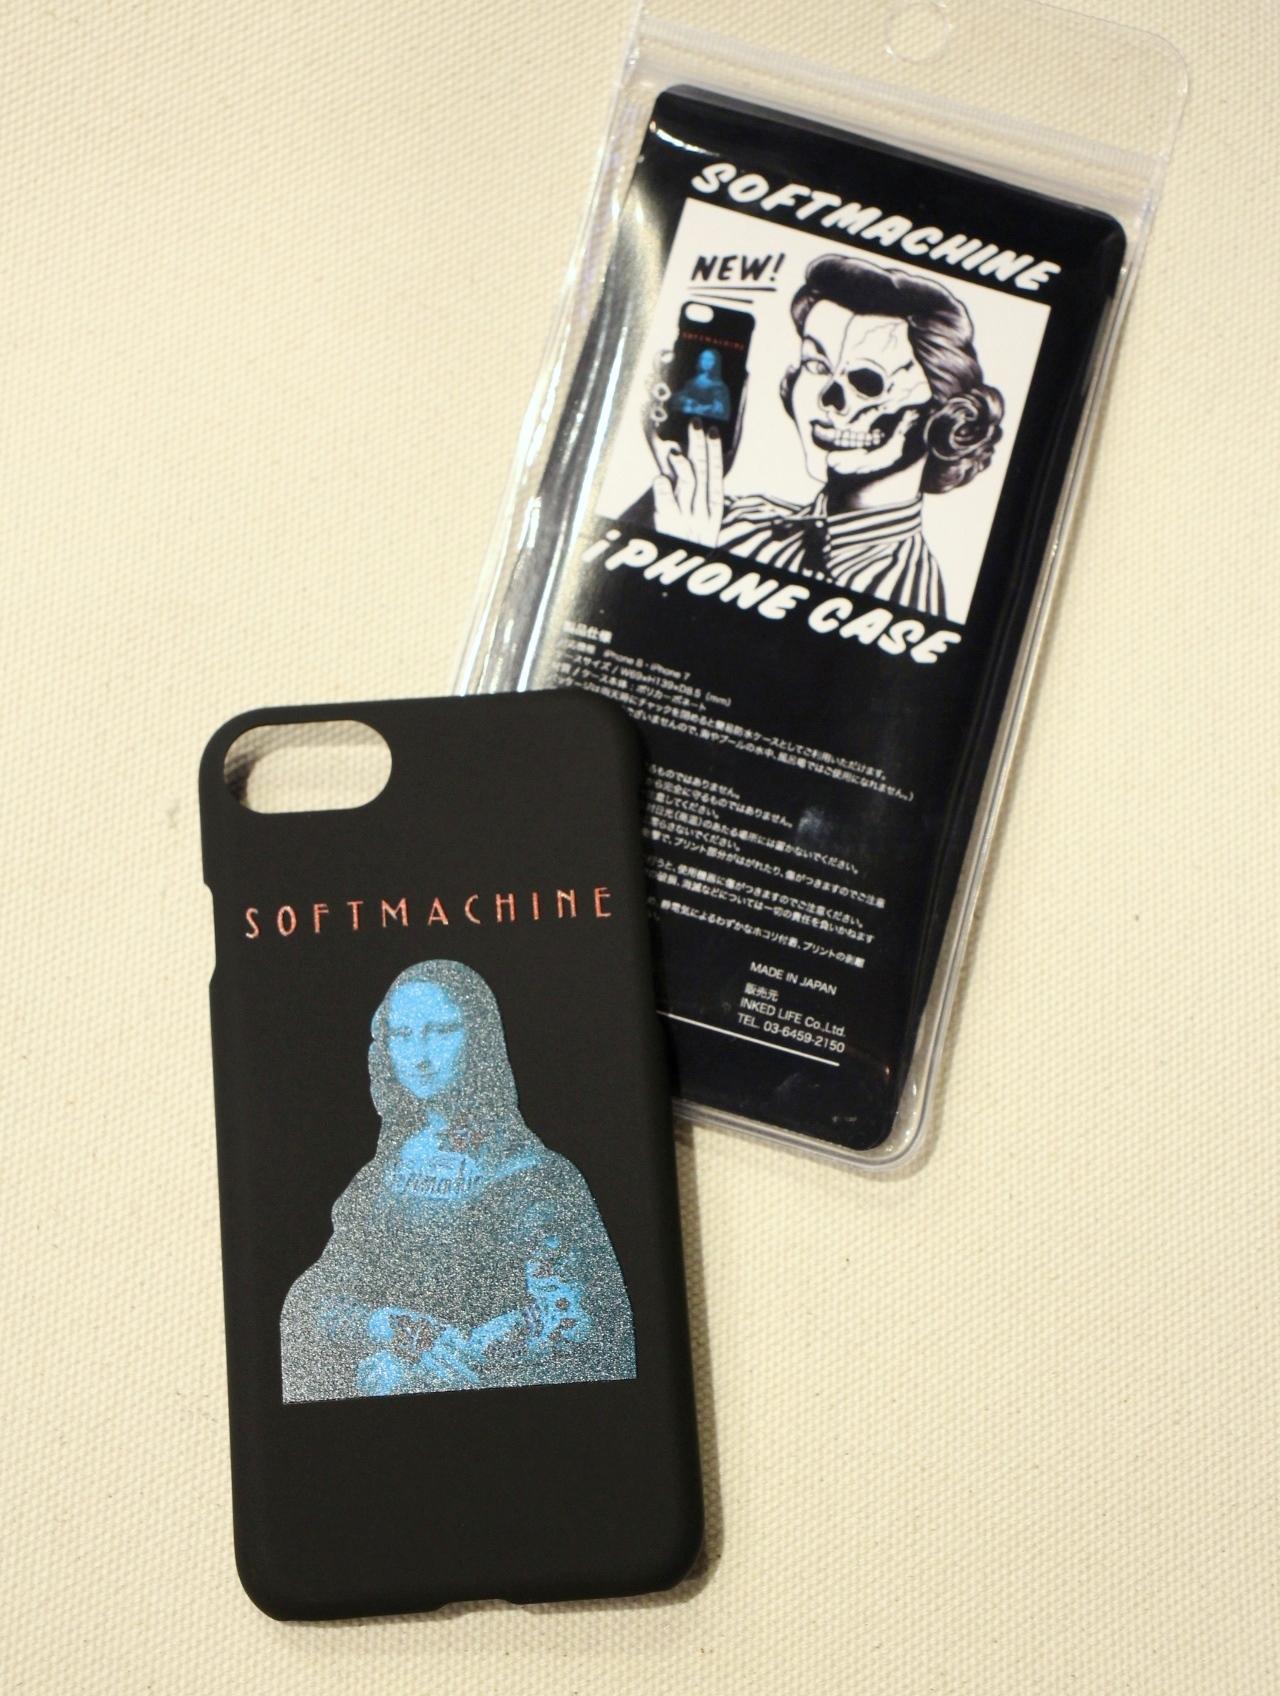 SOFTMACHINE   「JOCONDE iPhone CASE 7 & 8」 iPhone 7 & 8 ケース